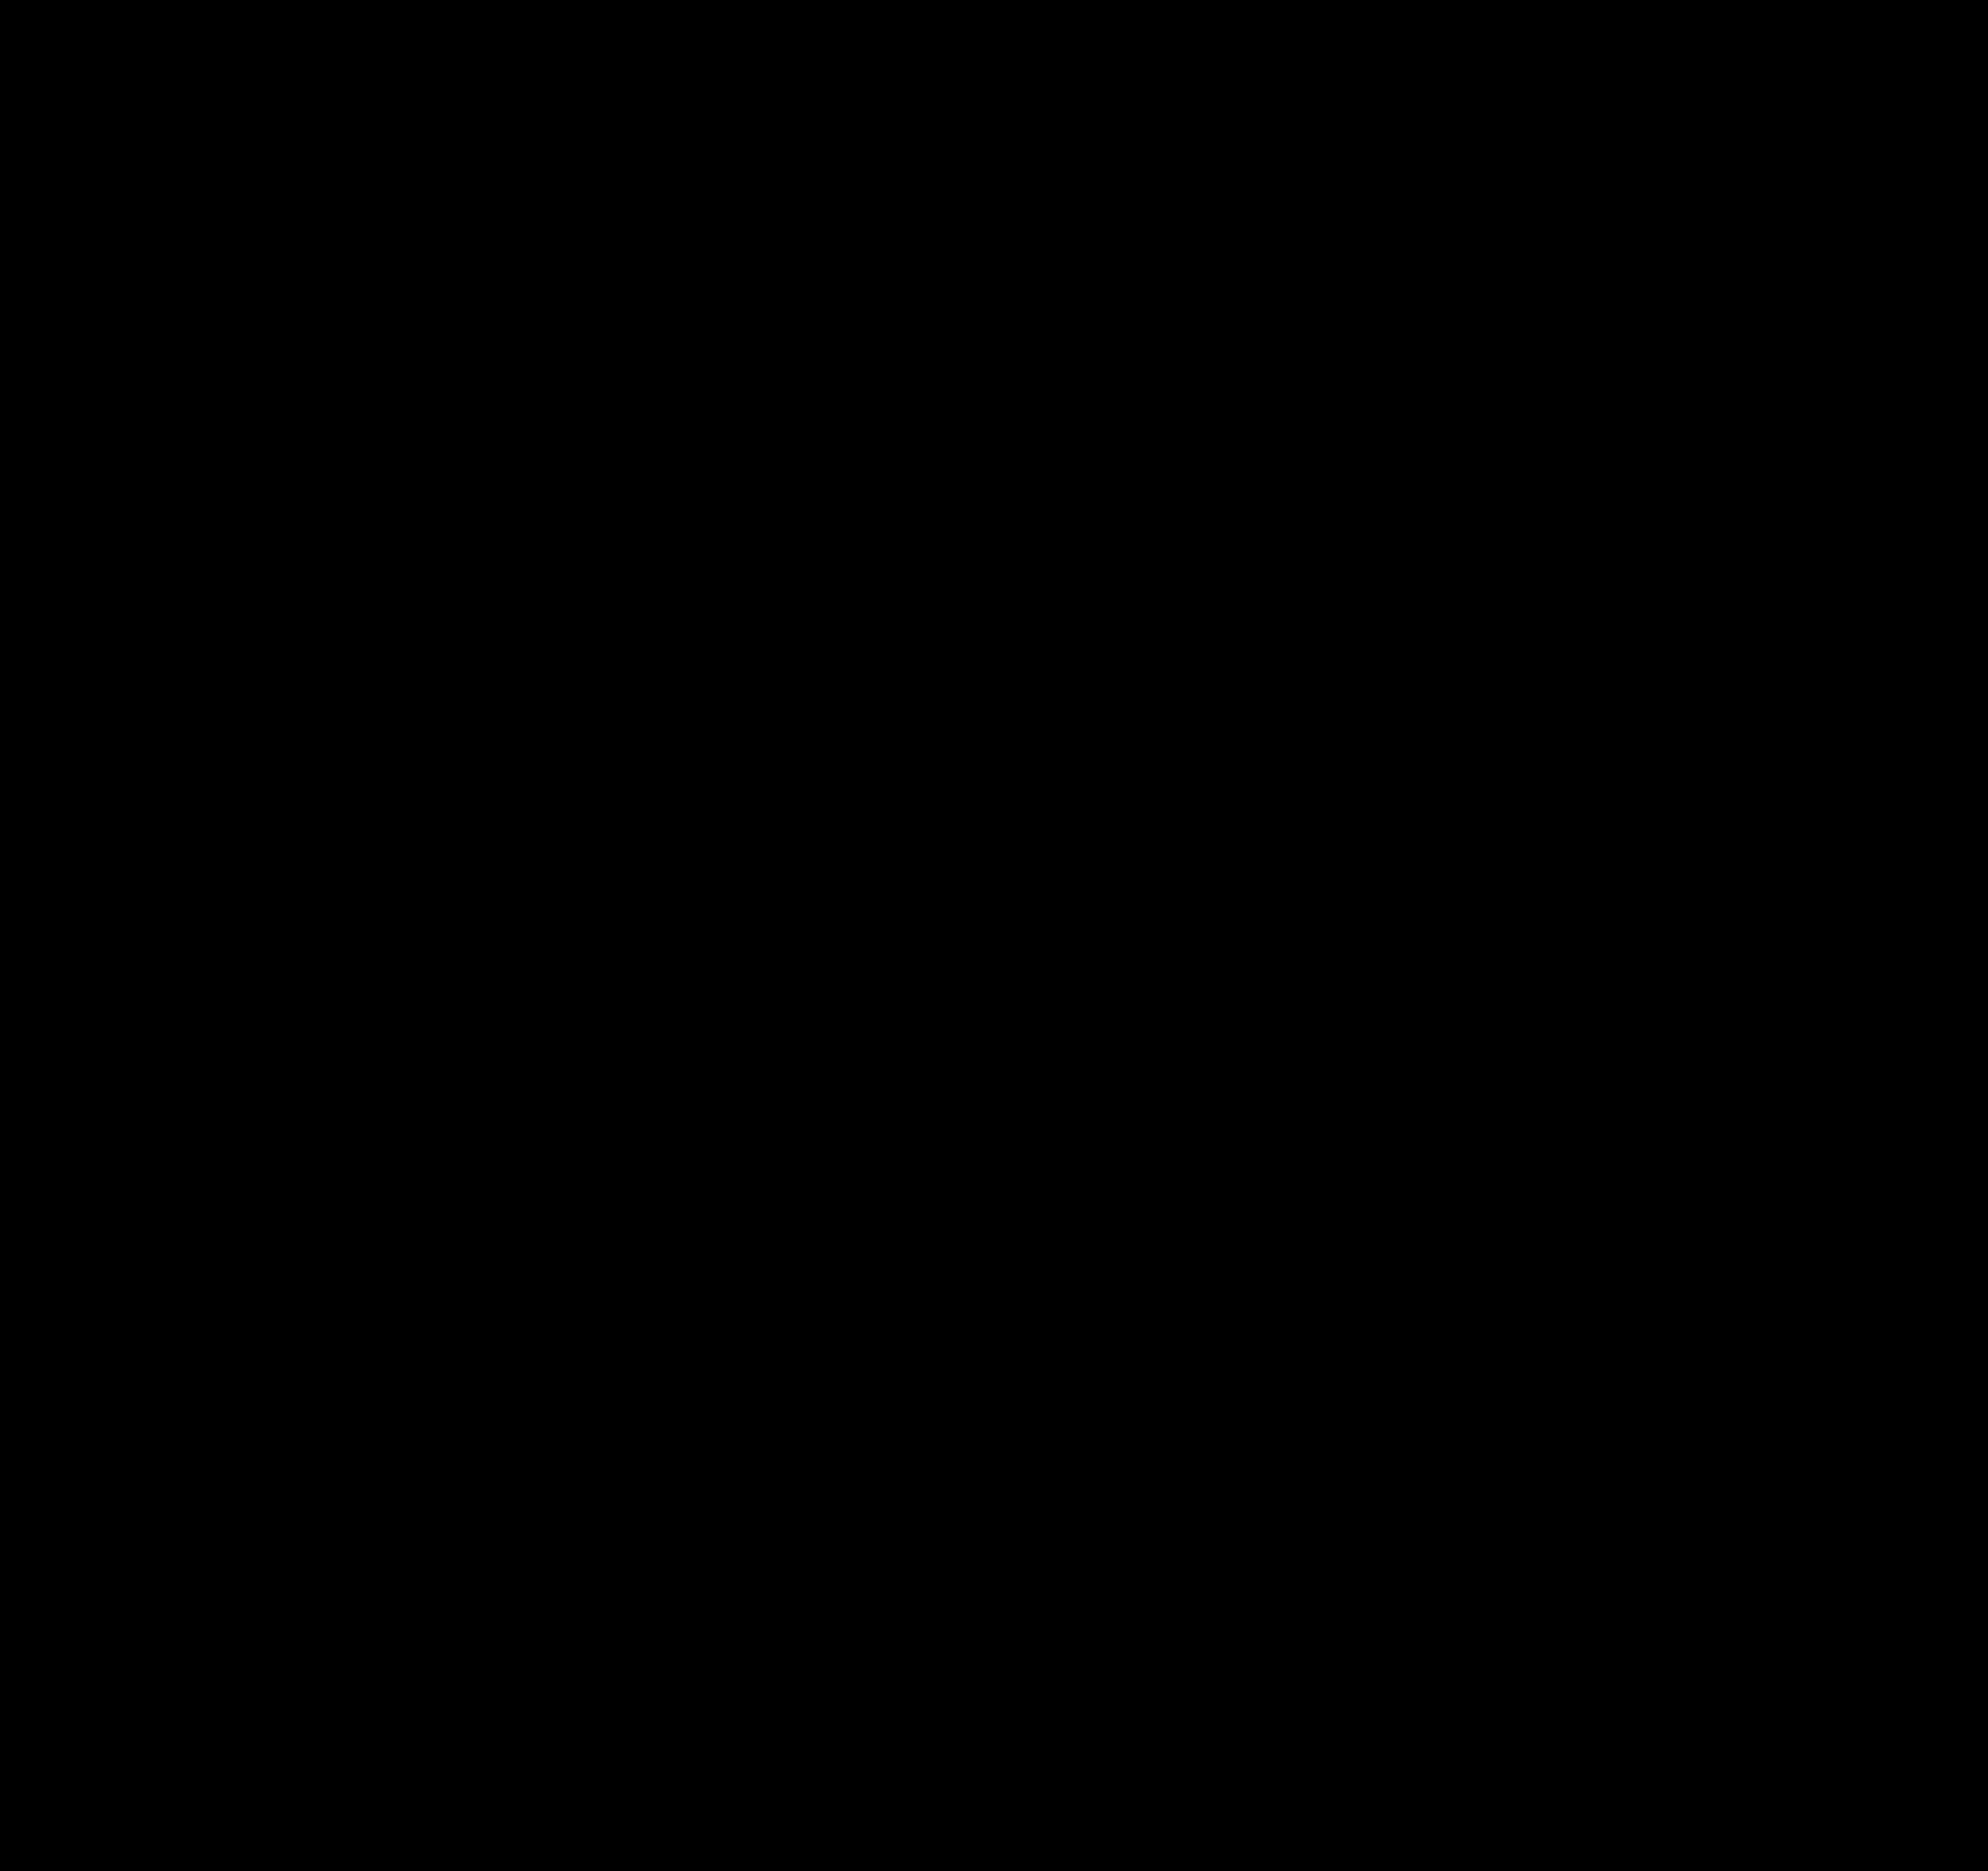 Hammer-PNG-Background-Image.png